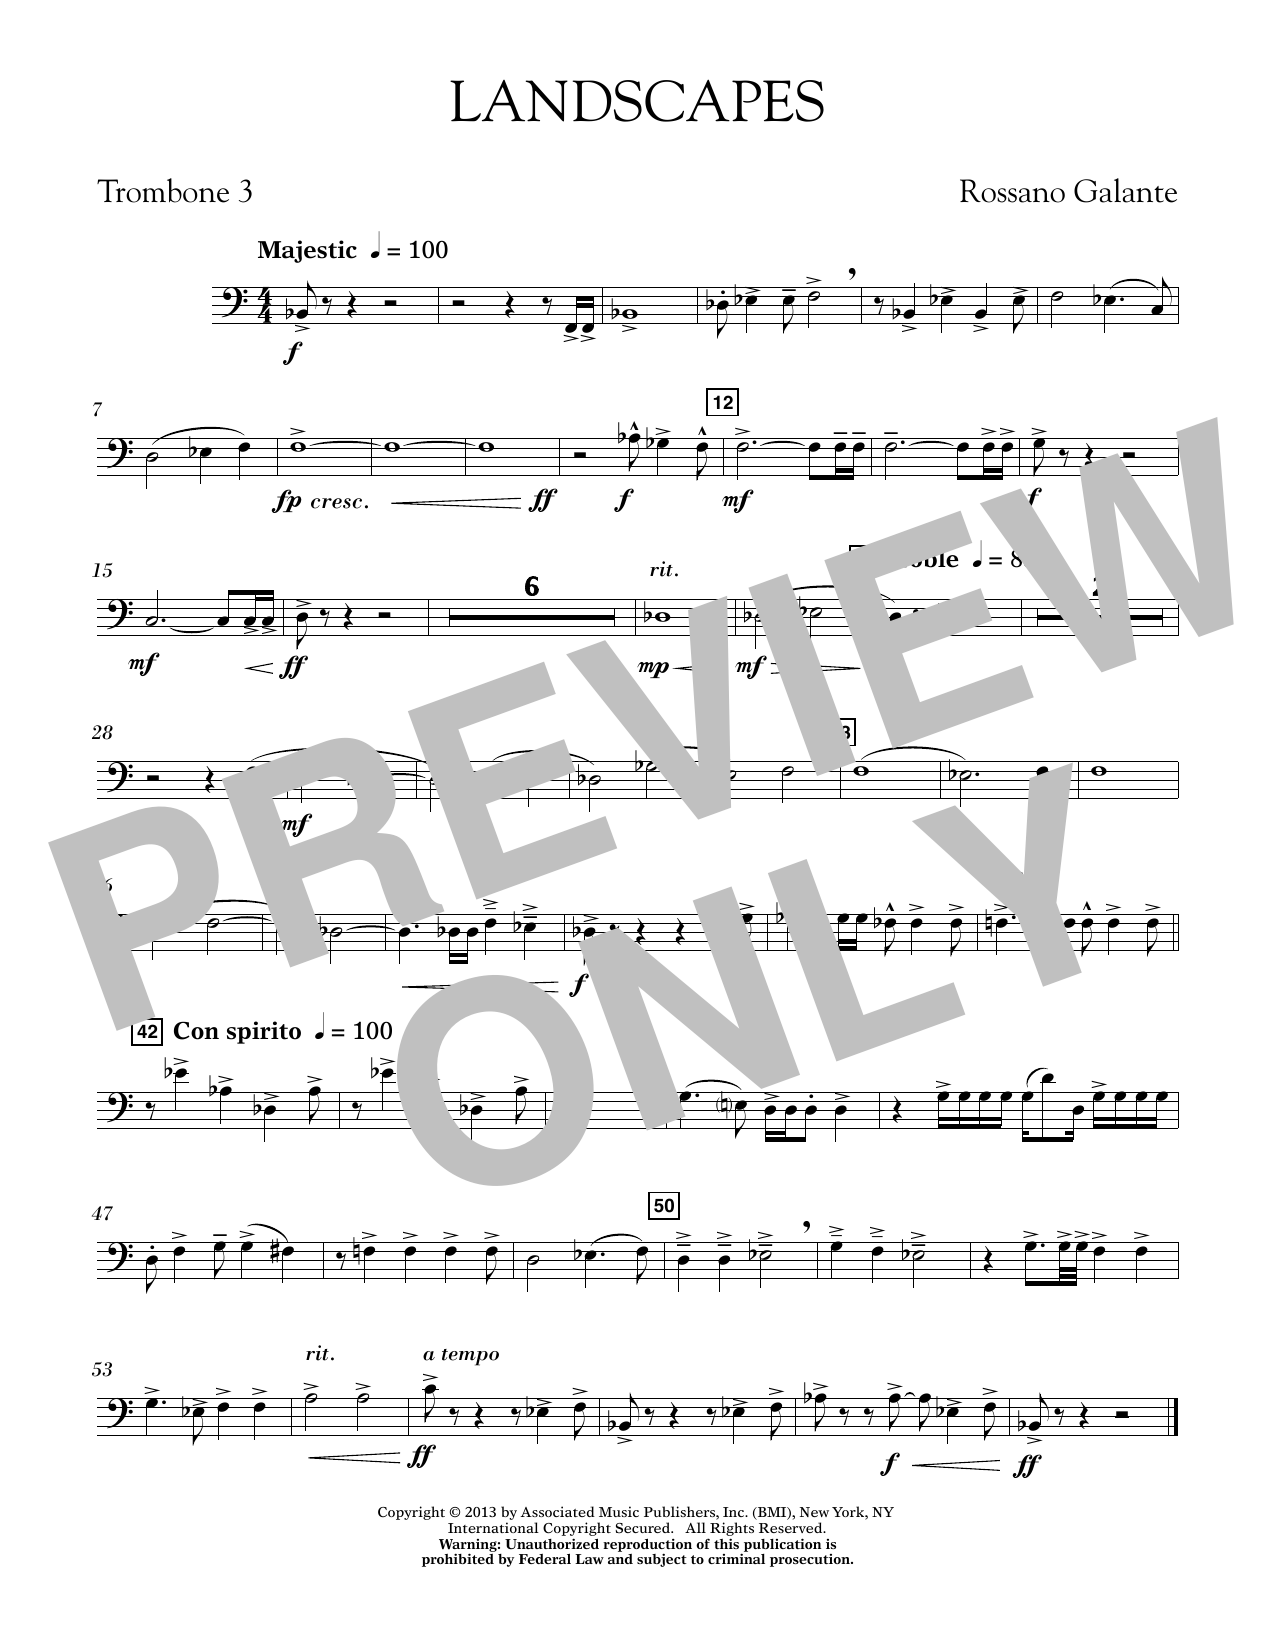 Rosanno Galante Landscapes - Trombone 3 sheet music notes printable PDF score